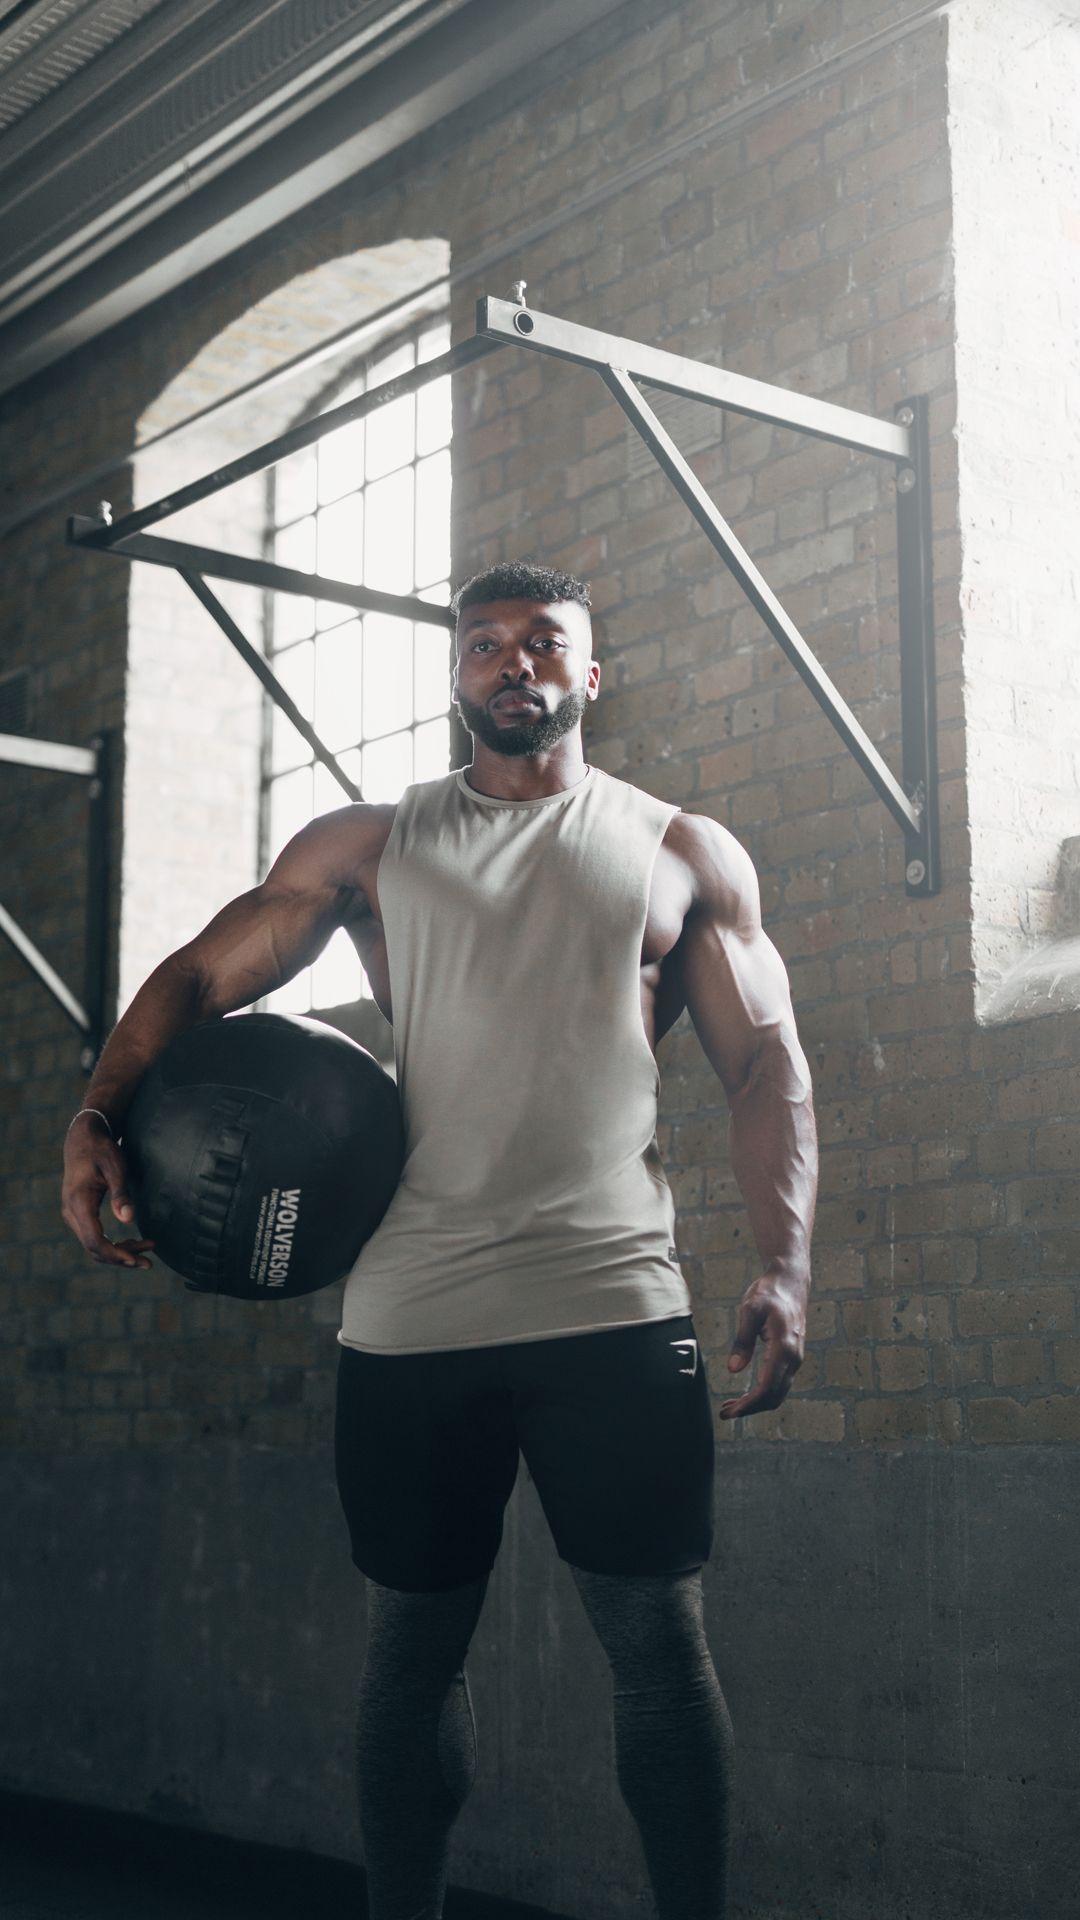 Gymshark athlete obi vincent wearing the eaze tank during his